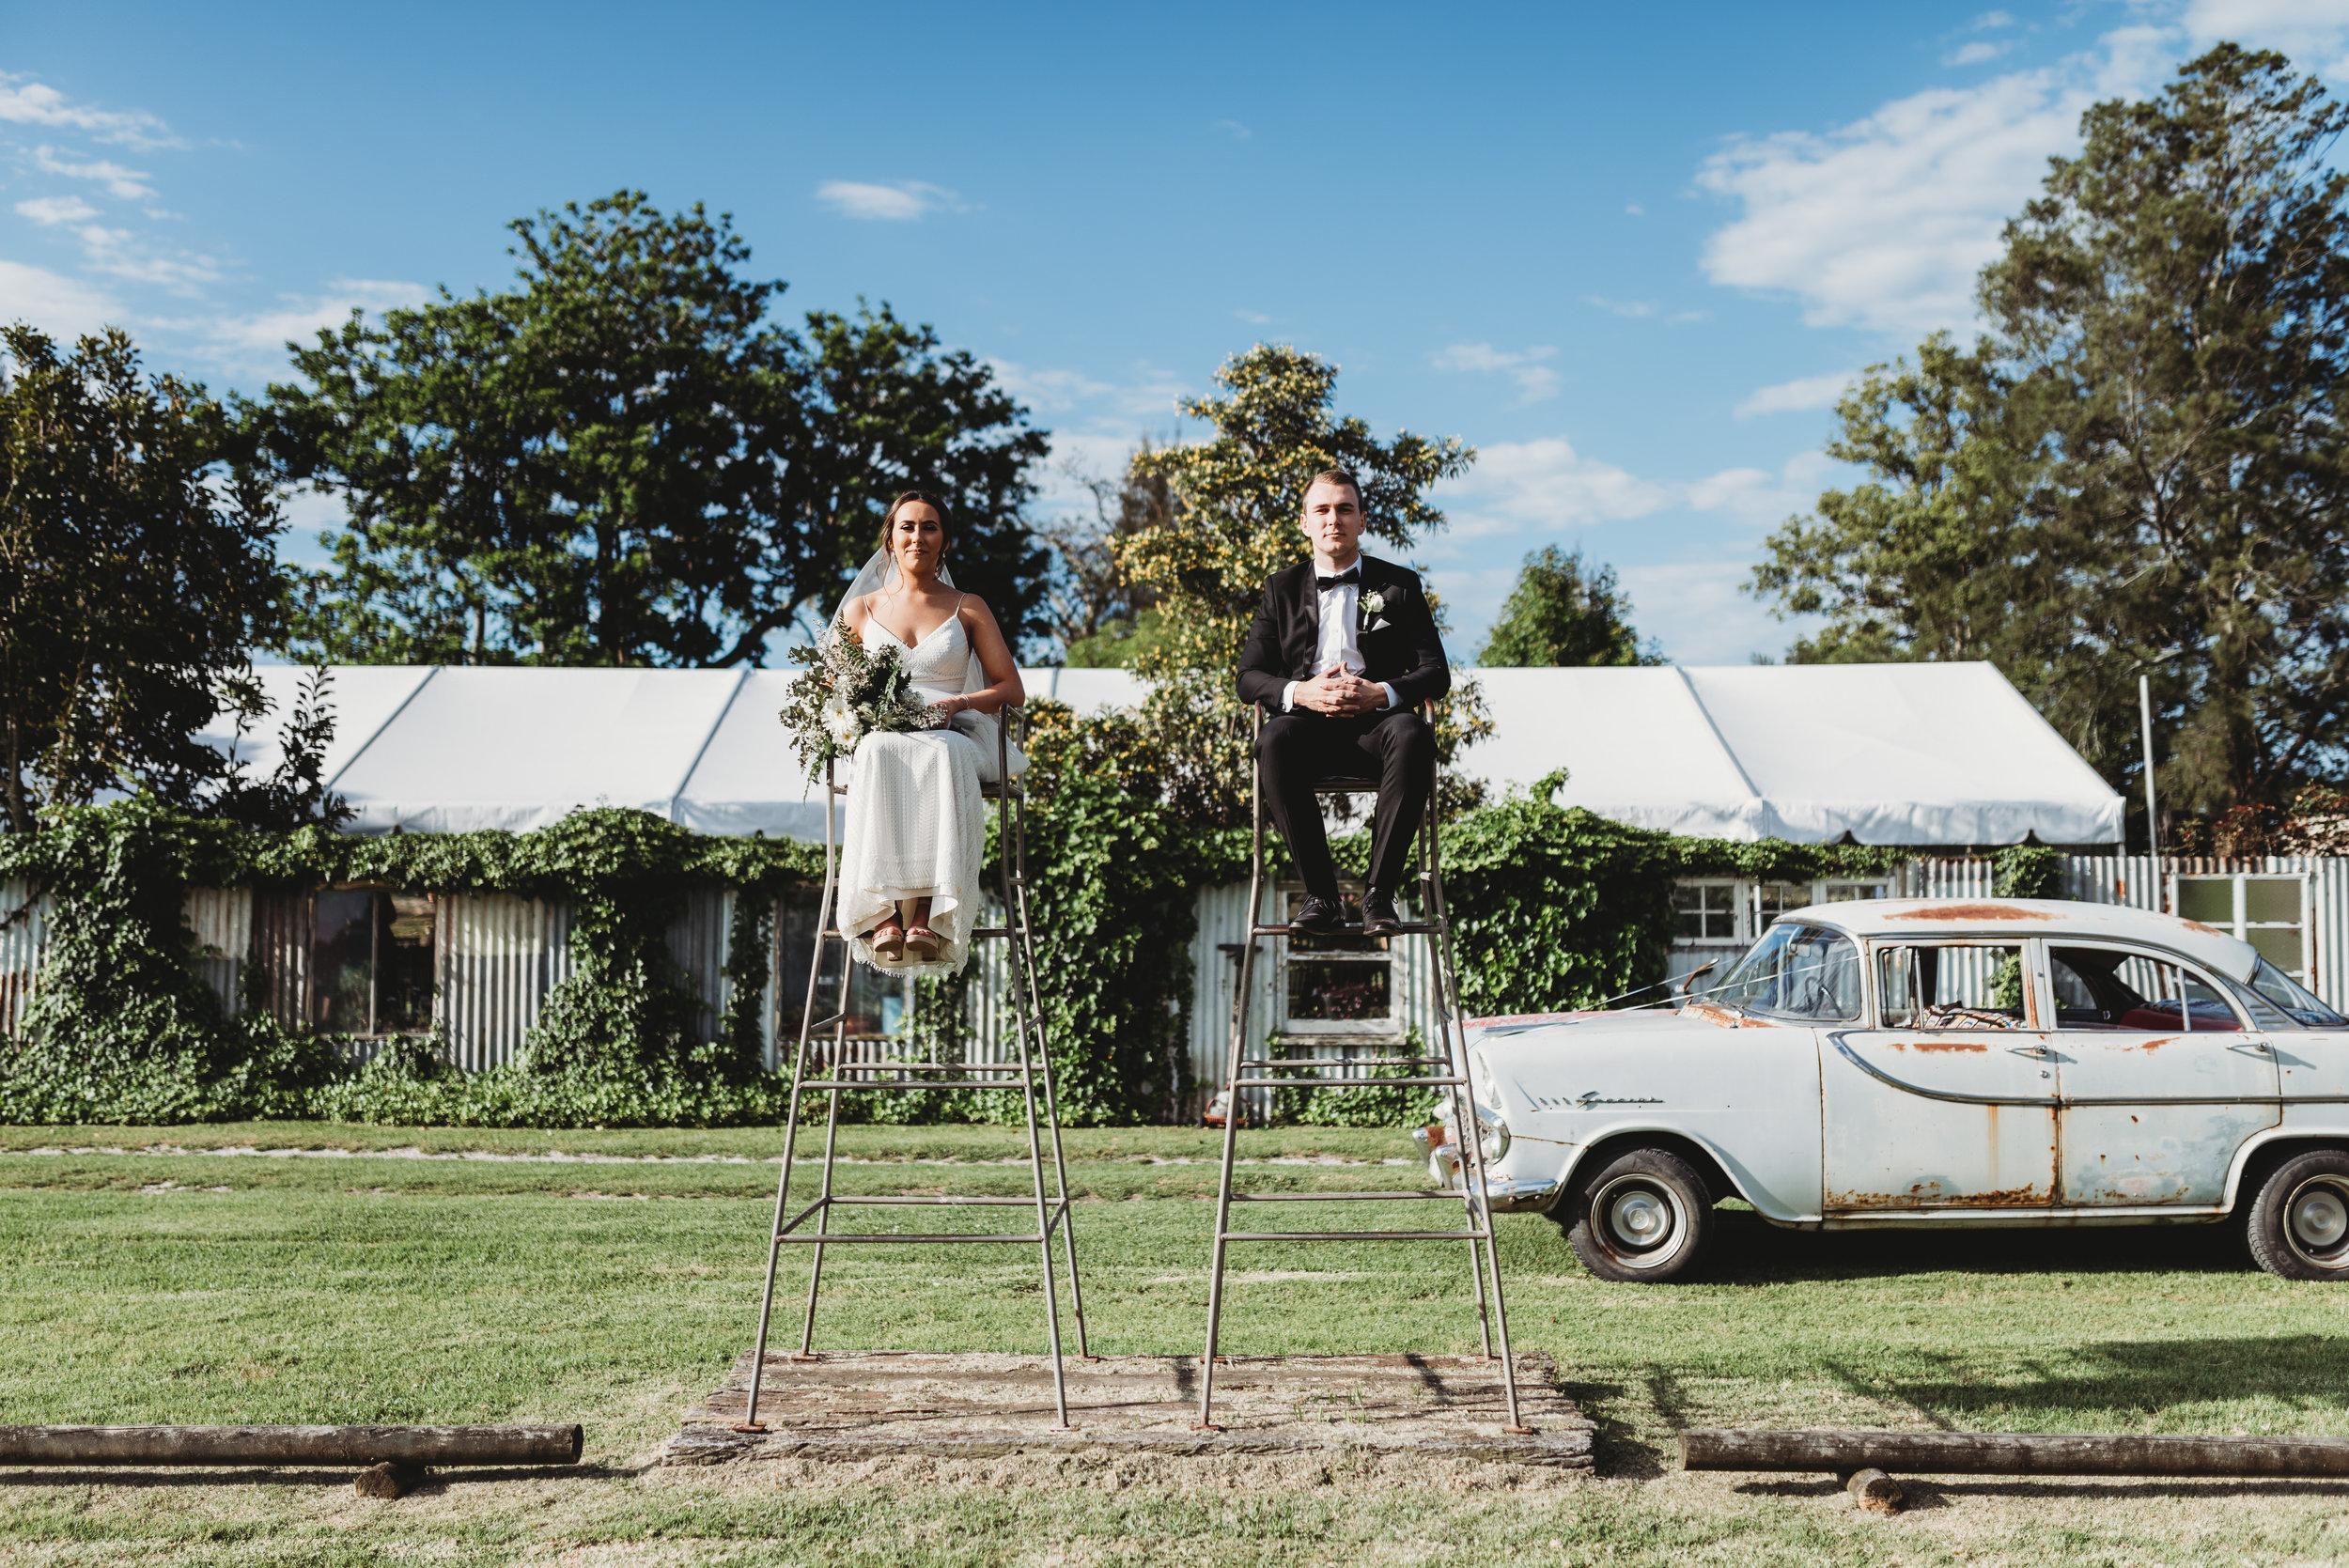 Ellen & Alan - Driftwood Shed Wedding     10th November 2018